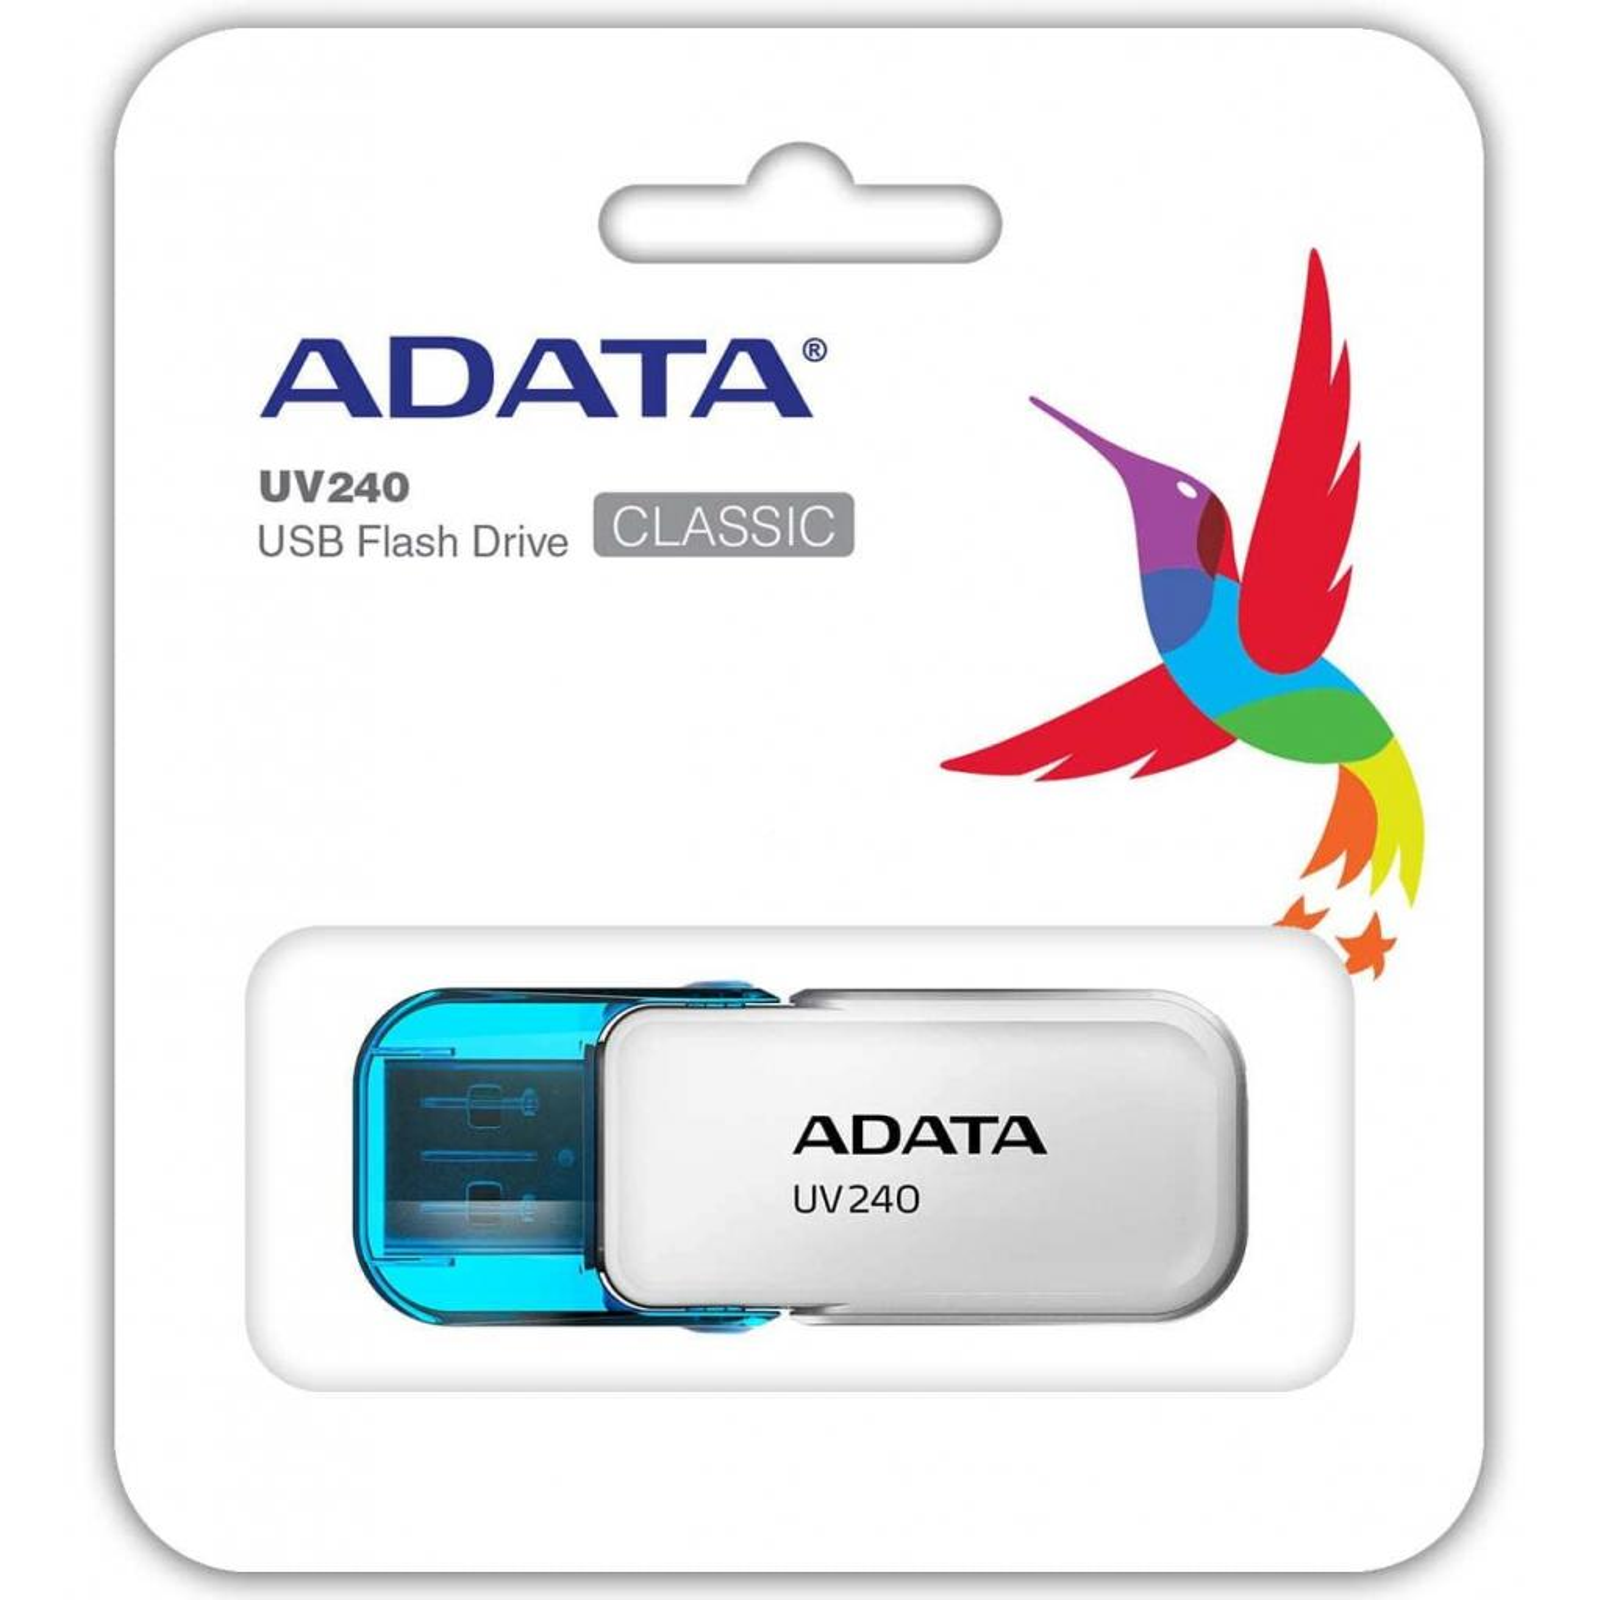 USB флеш накопитель A-DATA 8GB UV240 White USB 2.0 (AUV240-8G-RWH) изображение 3